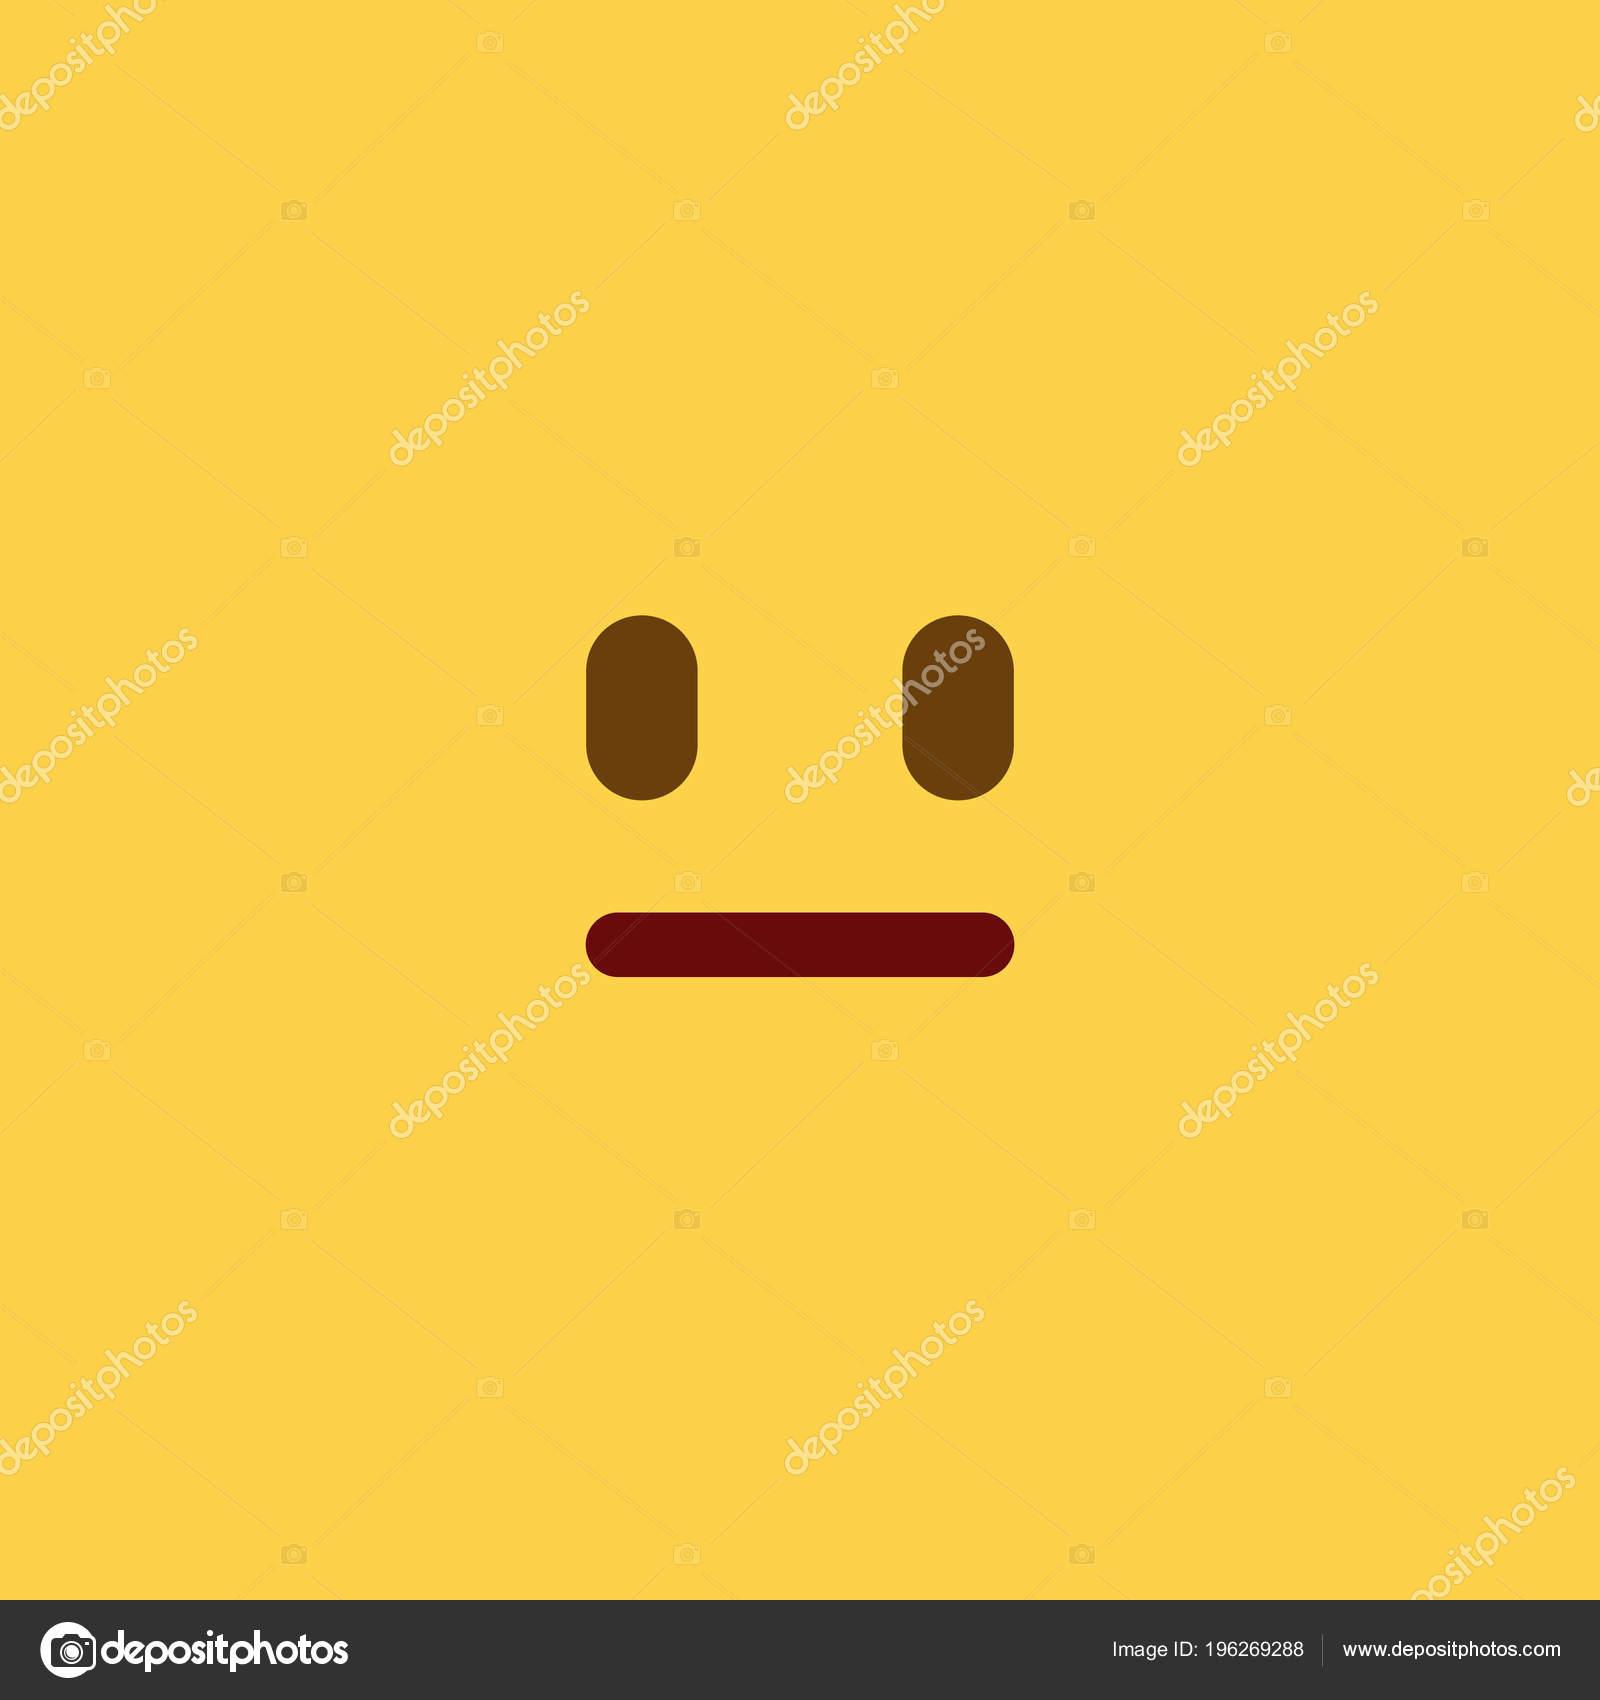 Neutre Carreau Style Emoji Image Vectorielle 5ughra